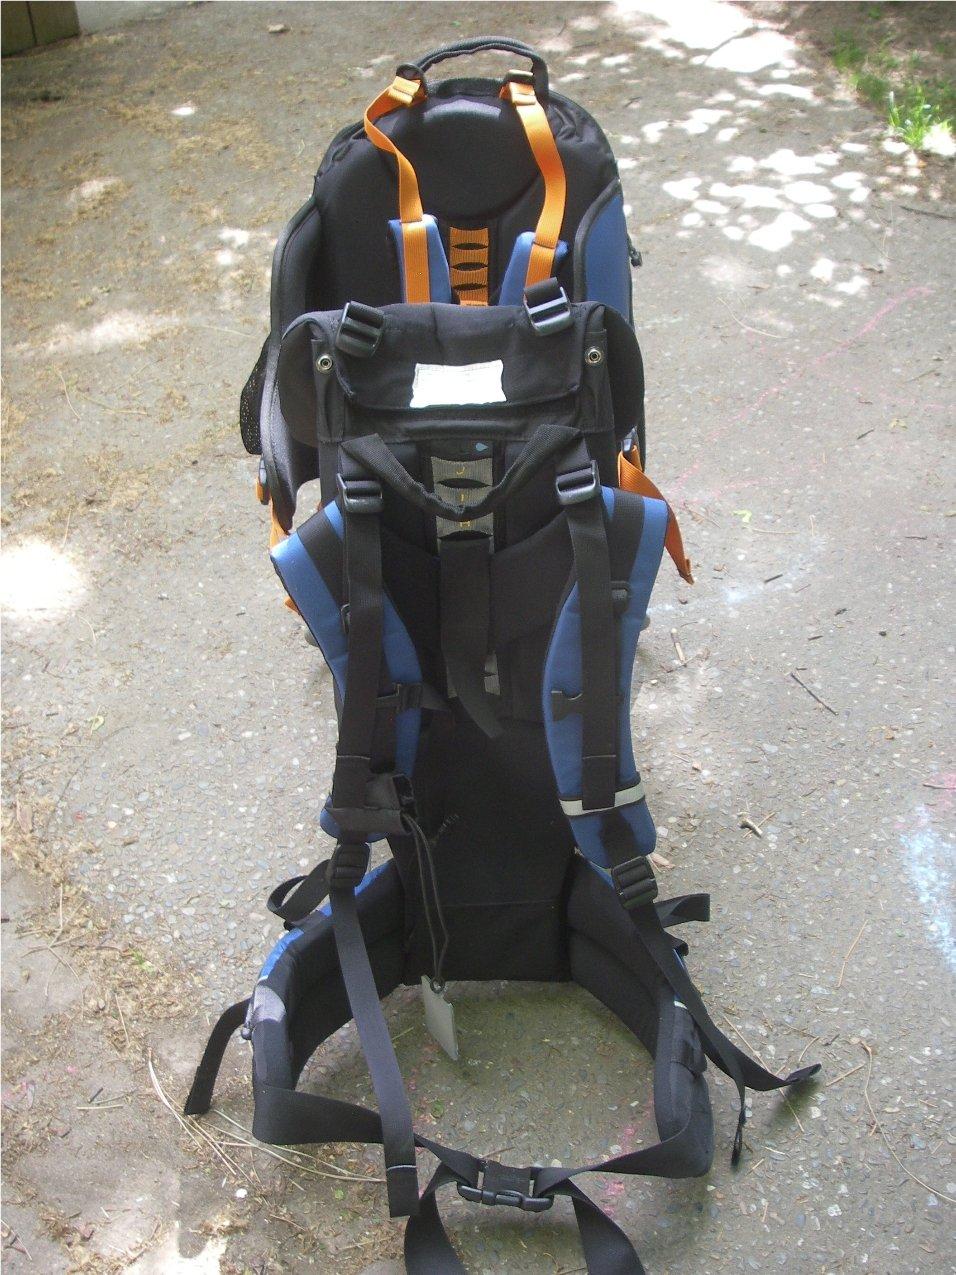 Amazon com : REI Piggyback Child Carrier with Detachable